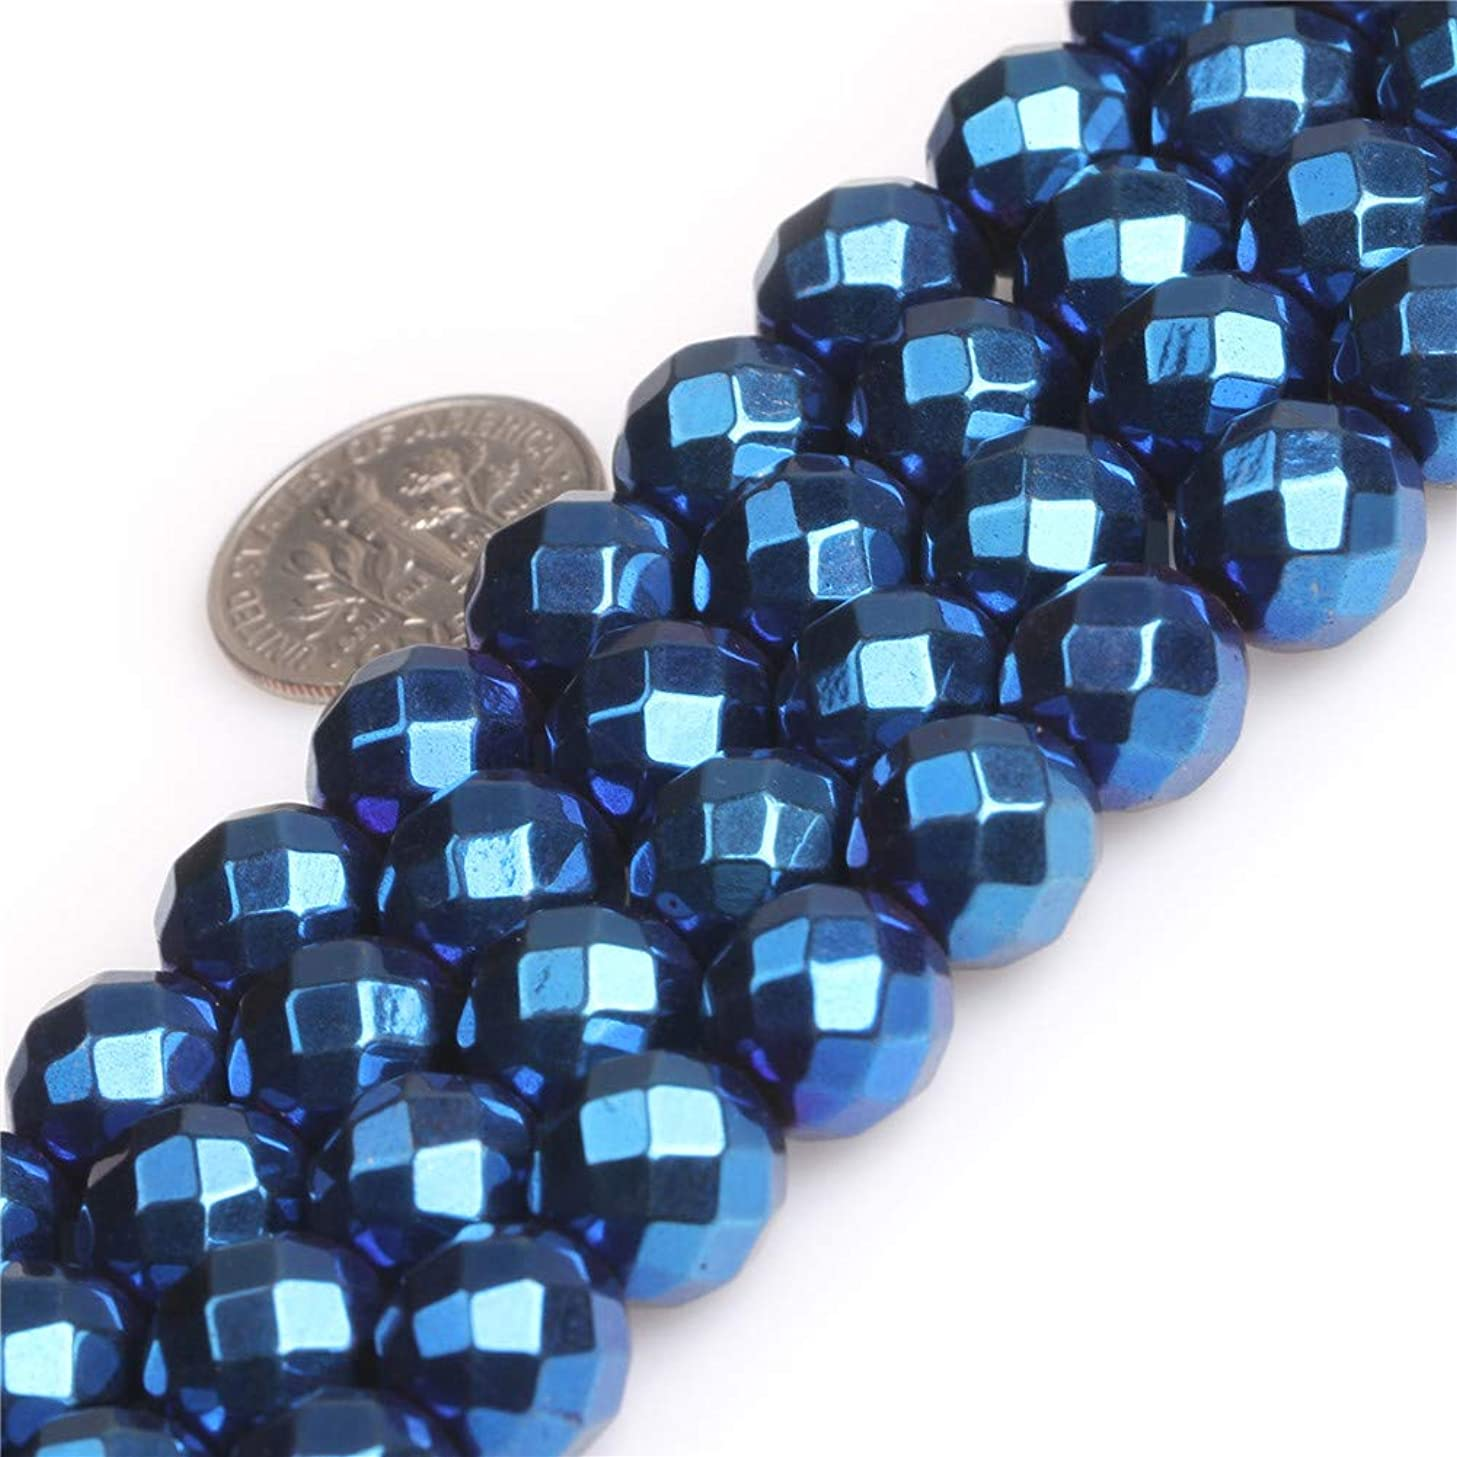 JOE FOREMAN Blue Metallic Coated Magnetic Hematite Gemstone Beads for Jewelry Making Strand 15